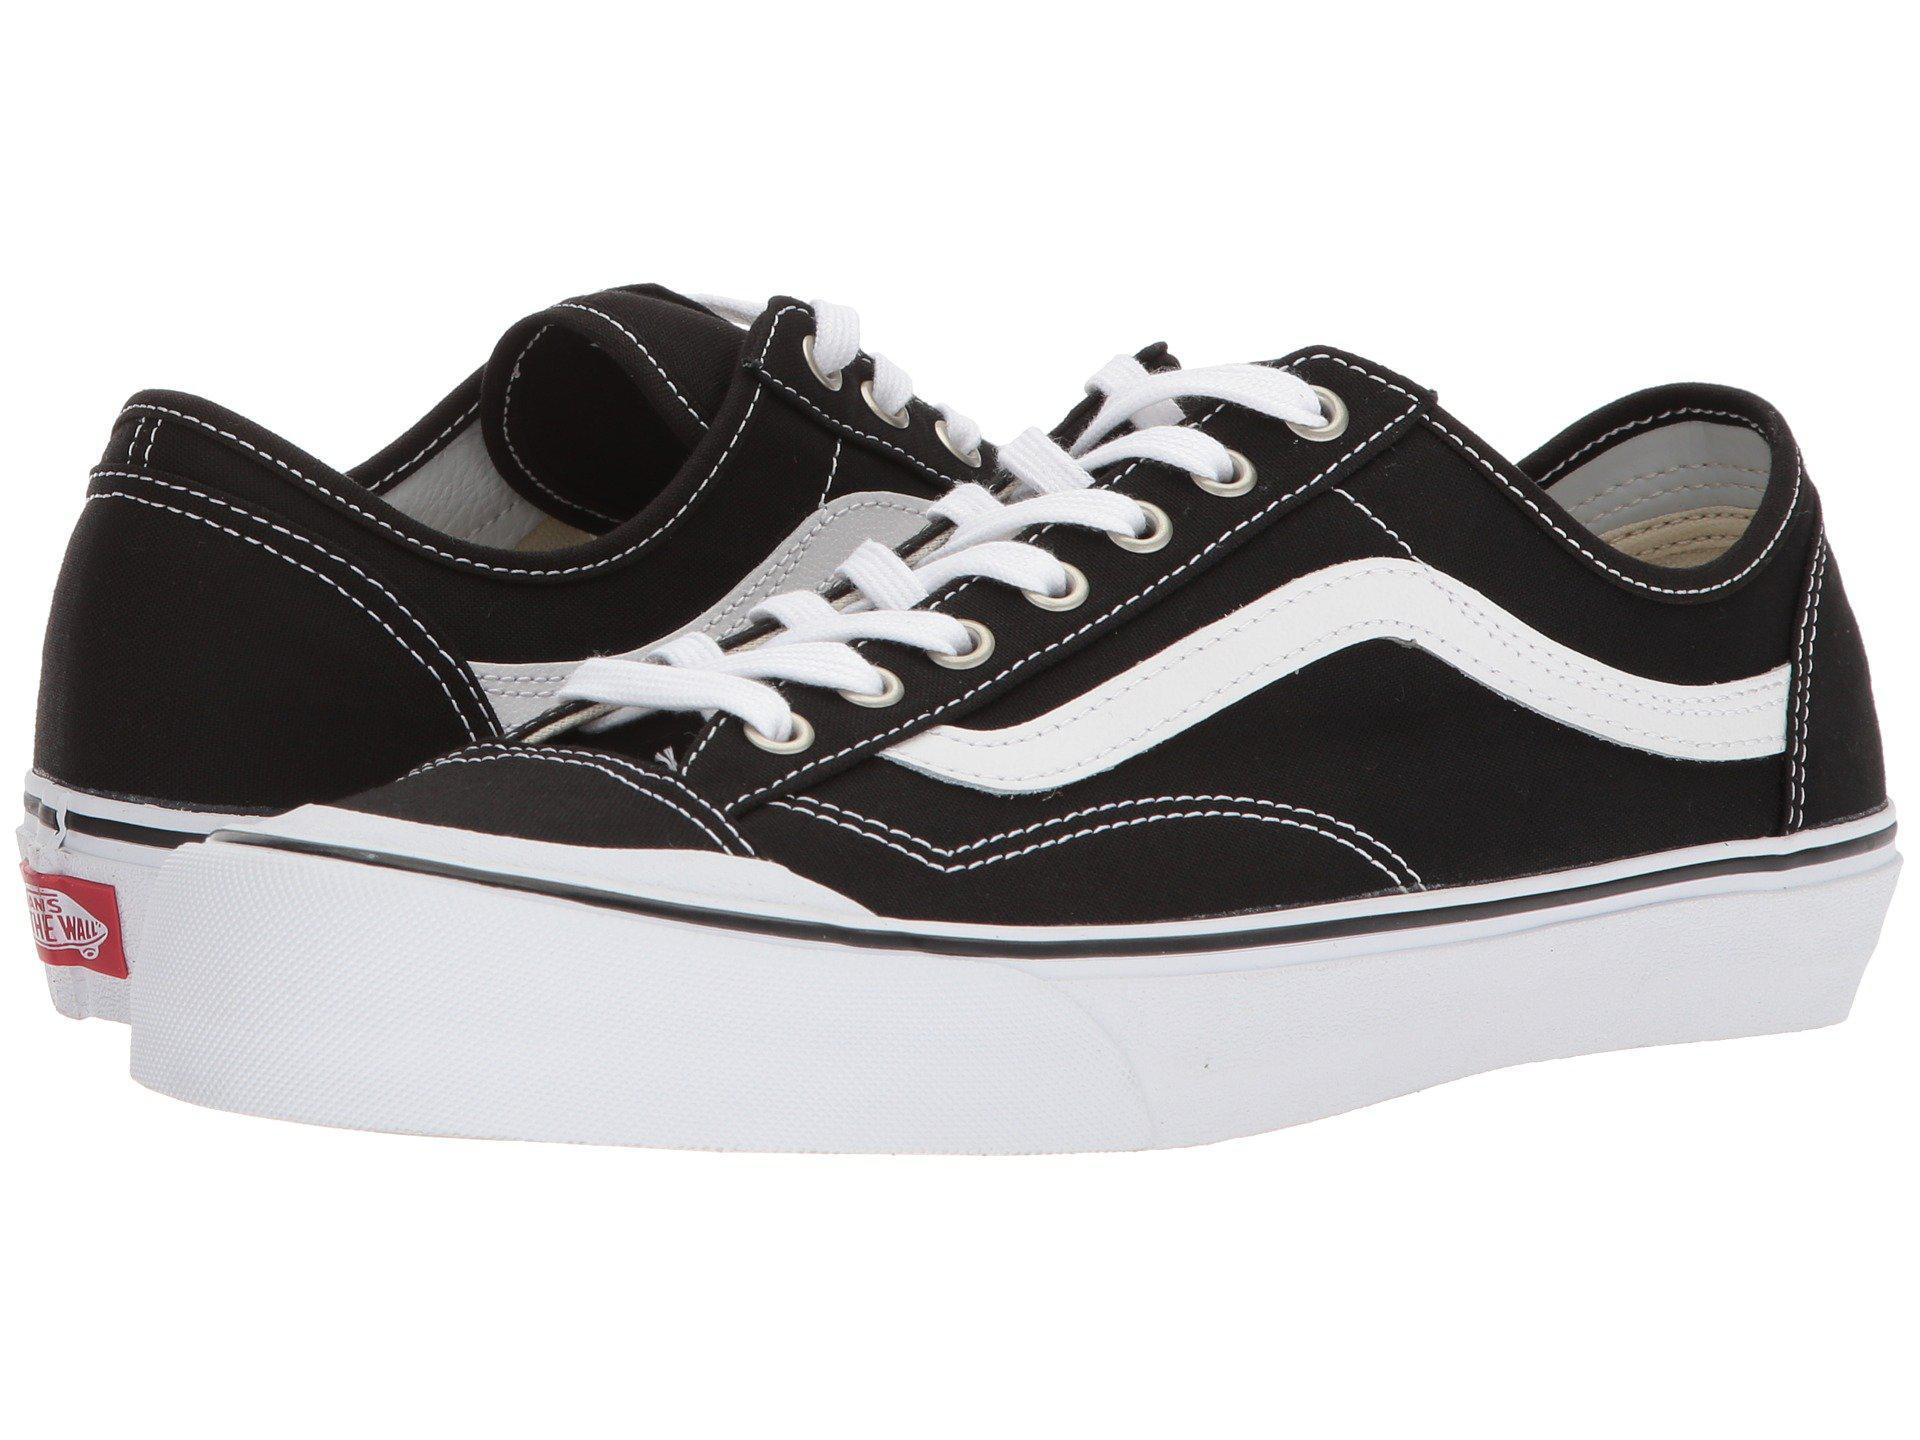 f549111b62 Lyst - Vans Style 36 Decon Sf (black white) Men s Skate Shoes in ...